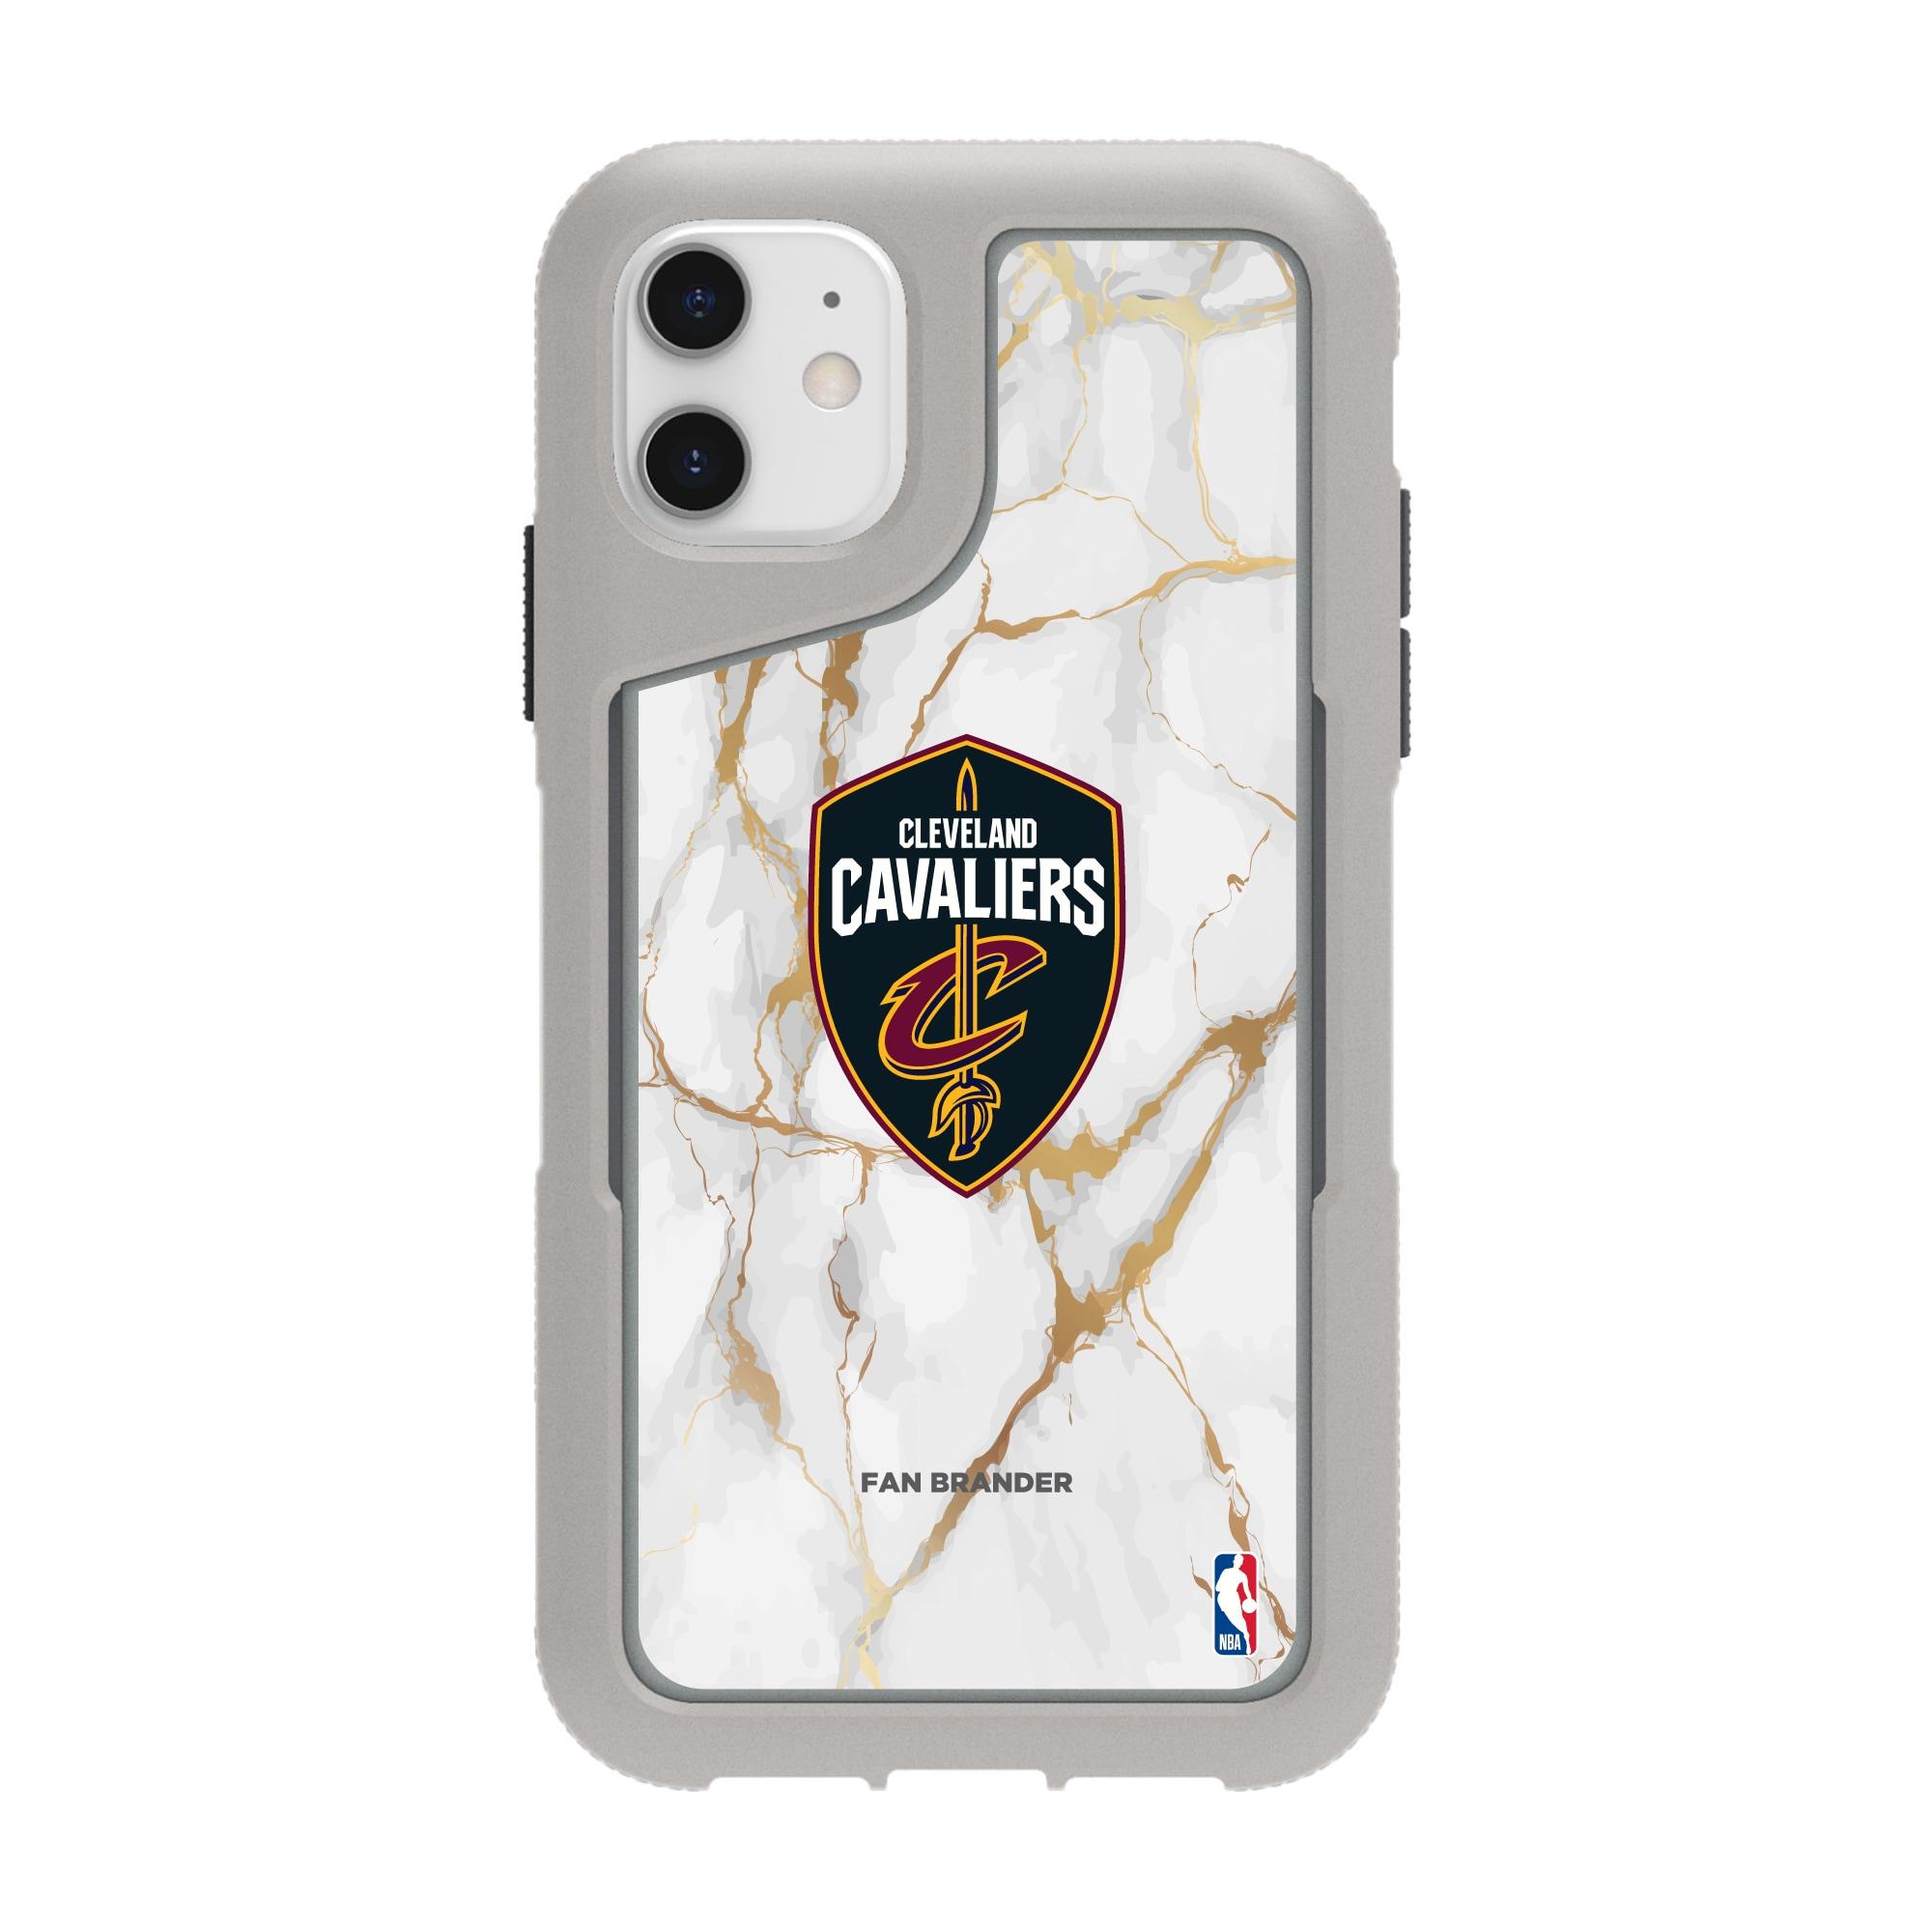 Cleveland Cavaliers Griffin Survivor Endurance Marble iPhone Case - Gray